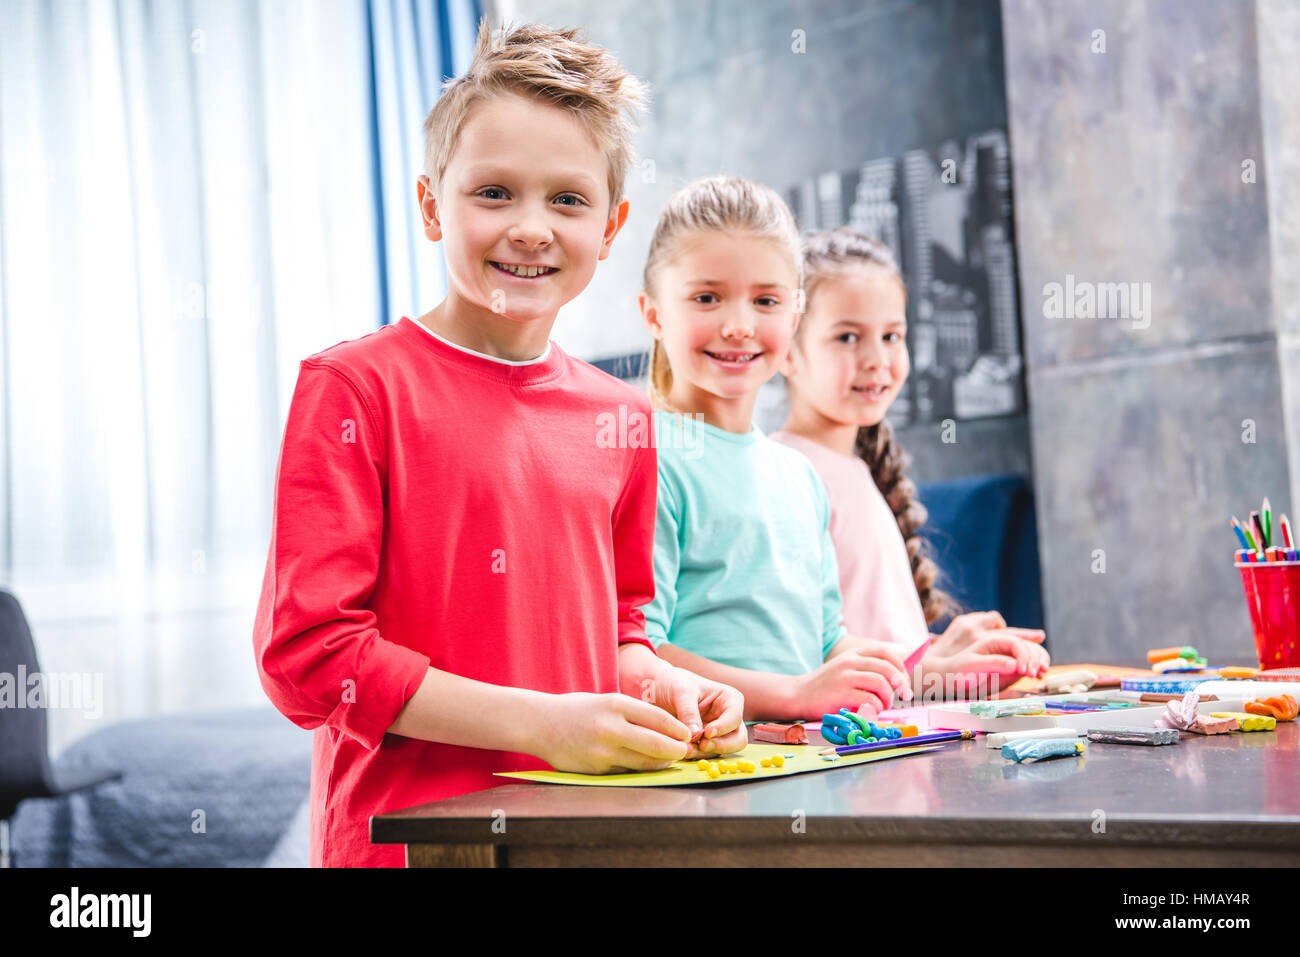 Schoolchildren playing with plasticine - Stock Image